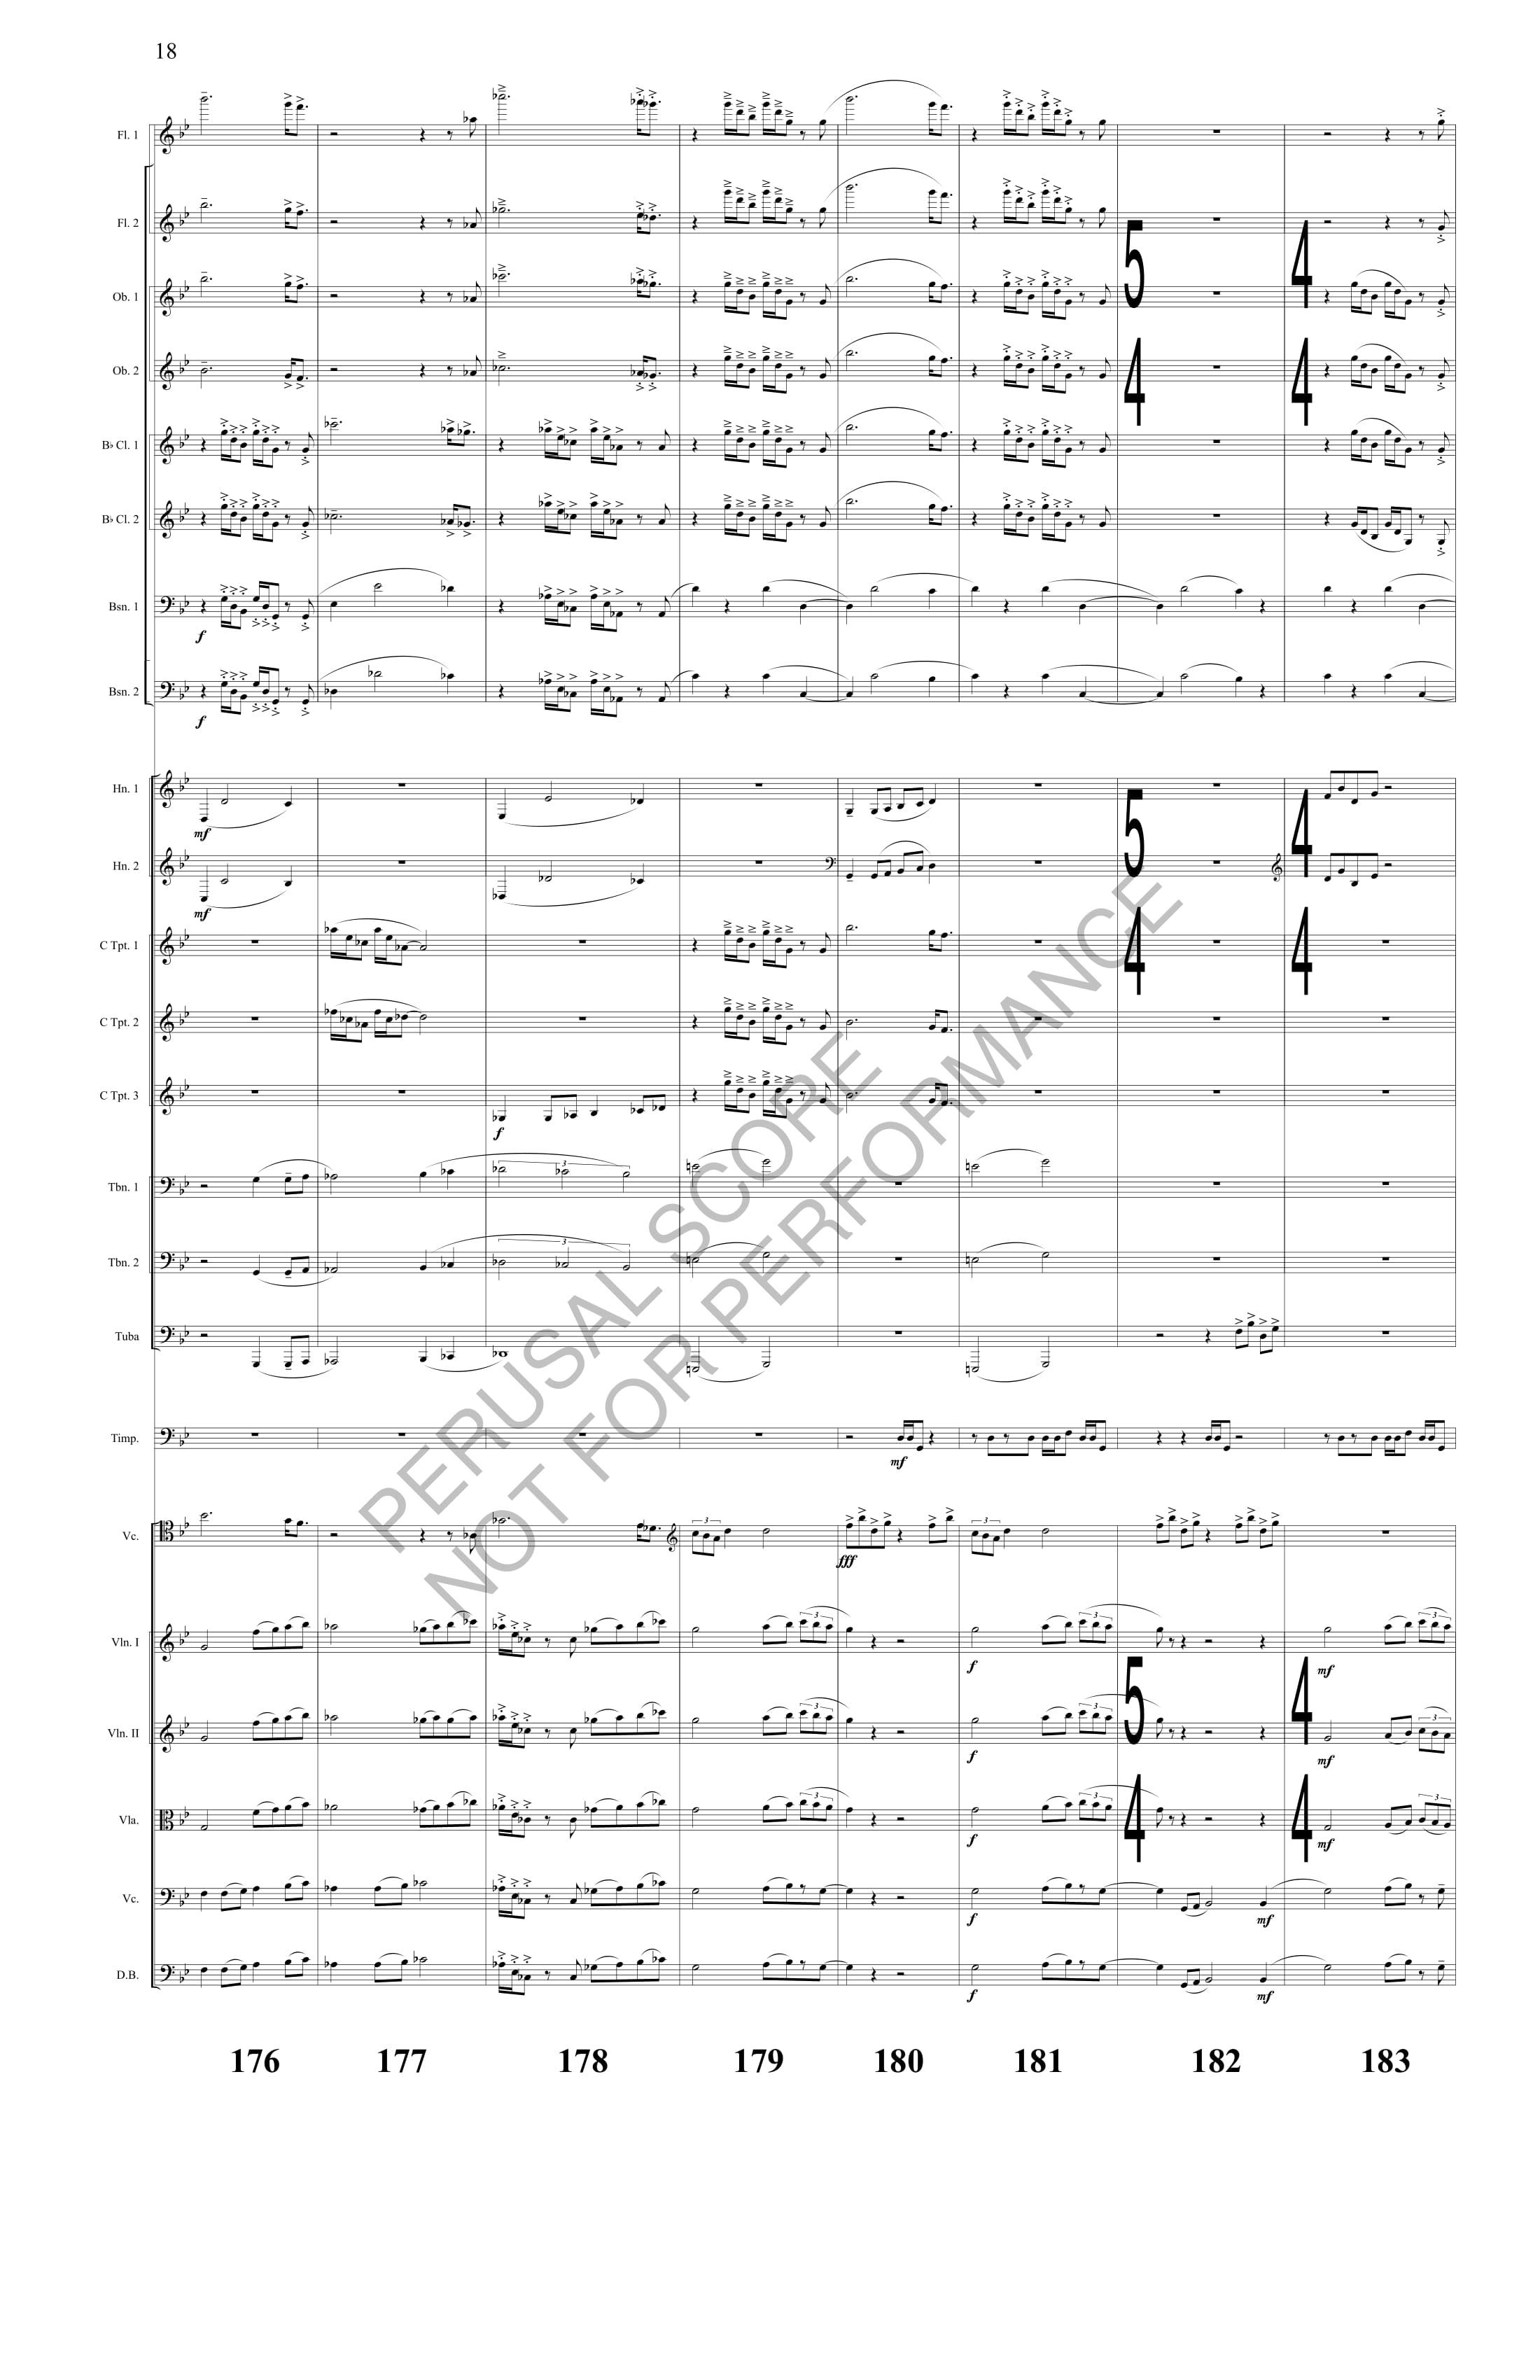 Boyd Tekton Score-watermark-24.jpg